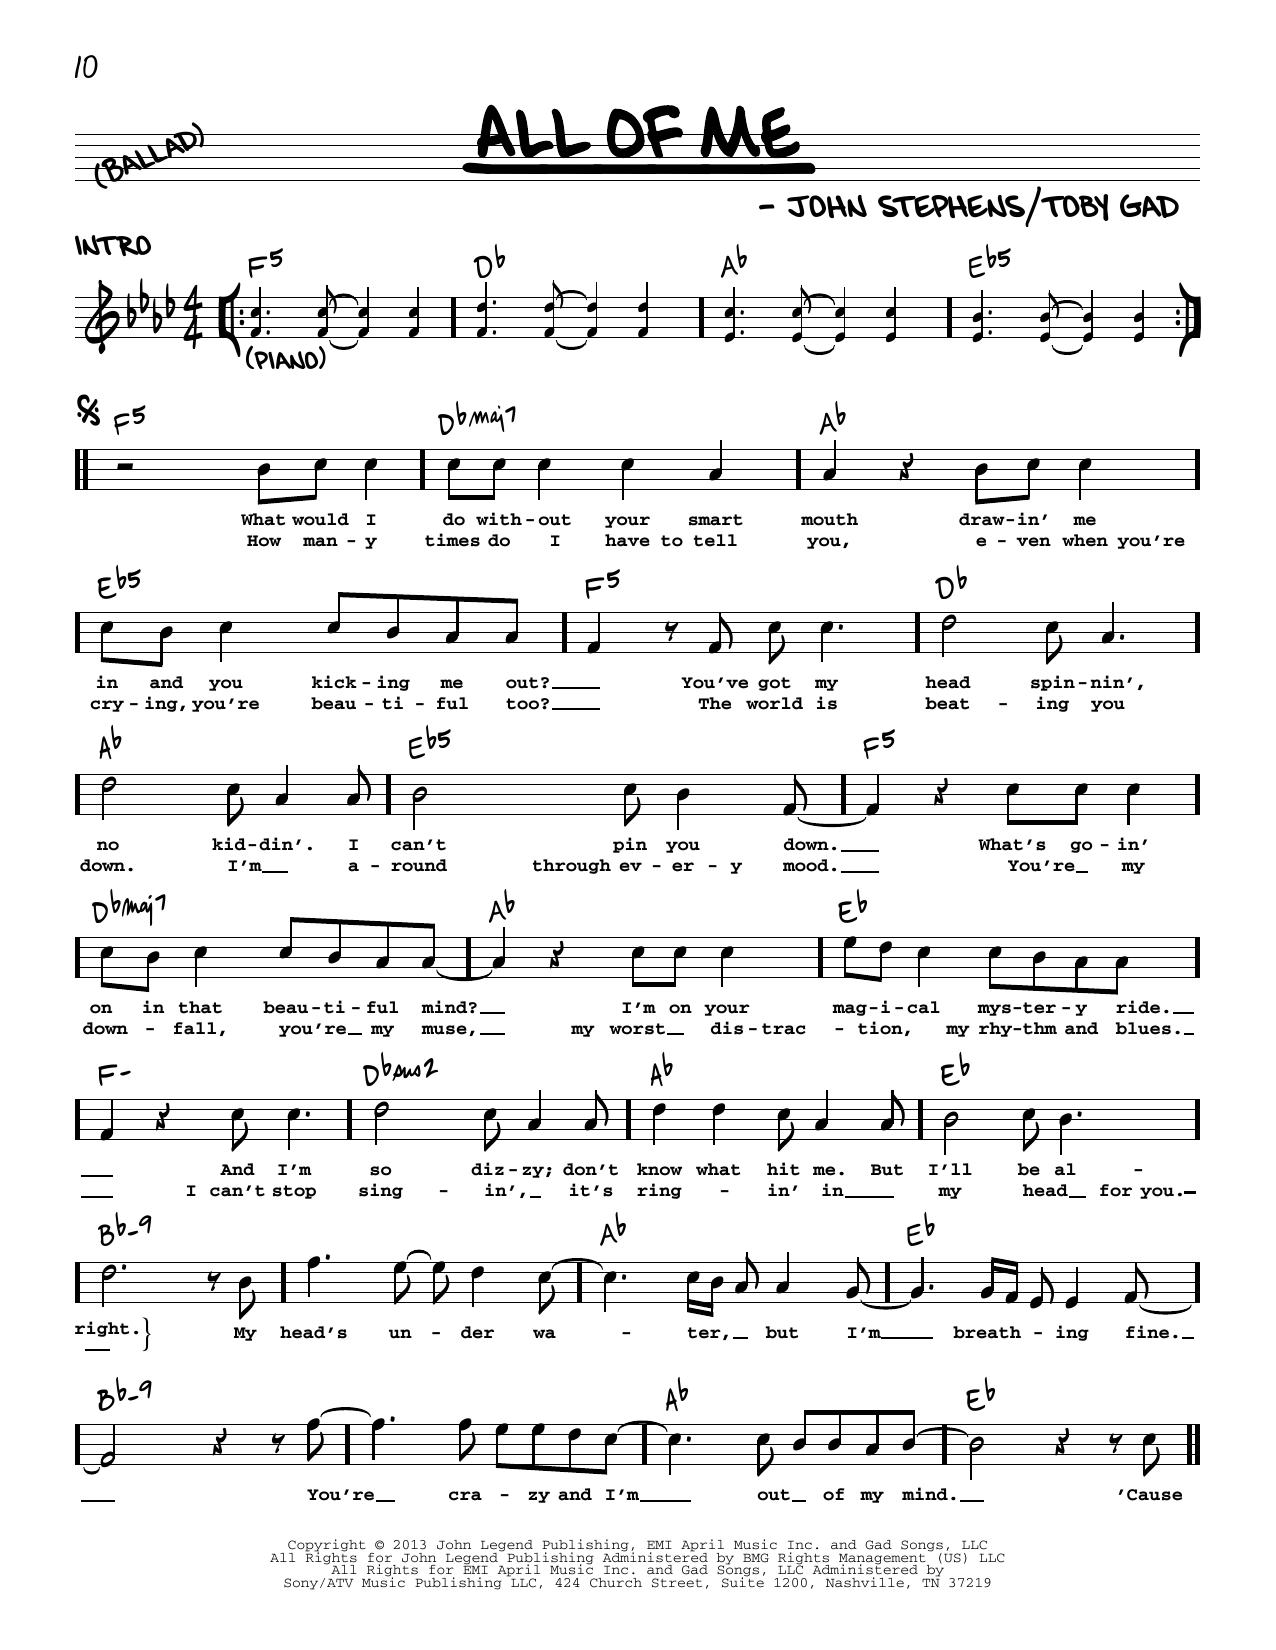 All Of Me Sheet Music   John Legend   Real Book – Melody, Lyrics & Chords